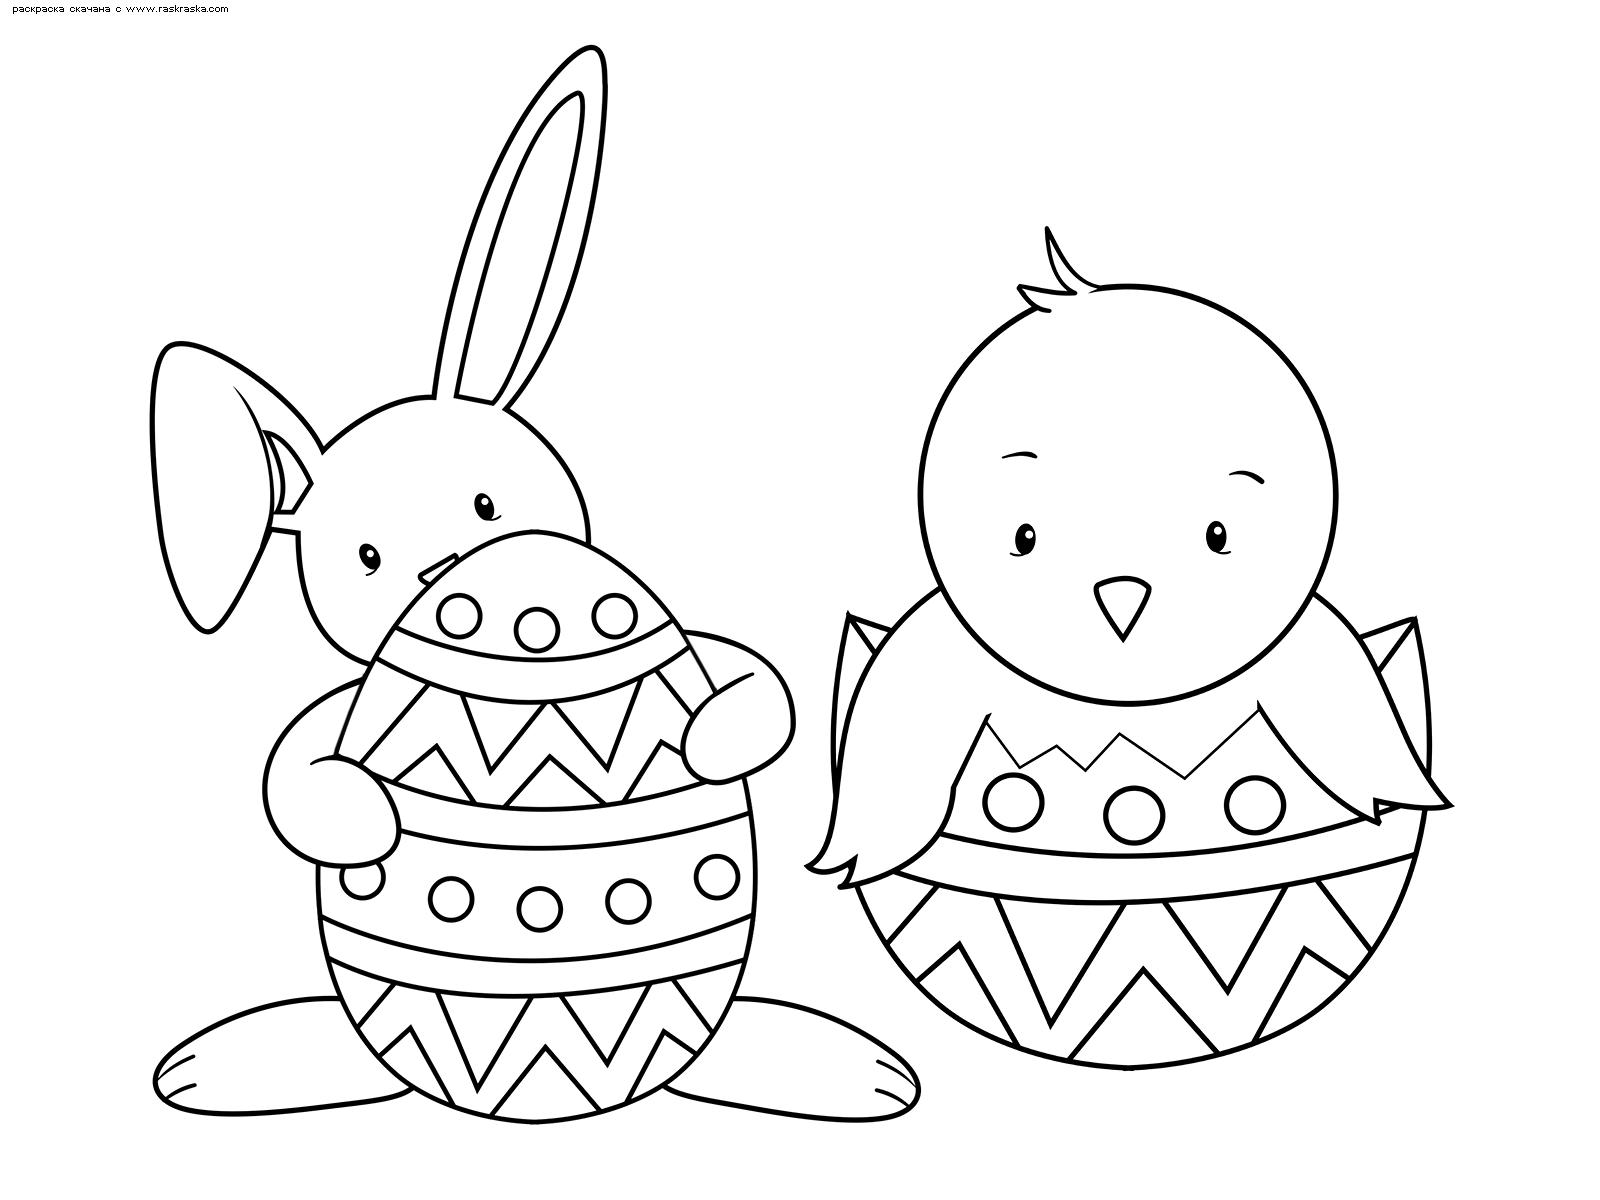 Раскраска Пасхальное яйцо. Раскраска Картинка для раскрашивая с пасхой, пасхальная раскраска